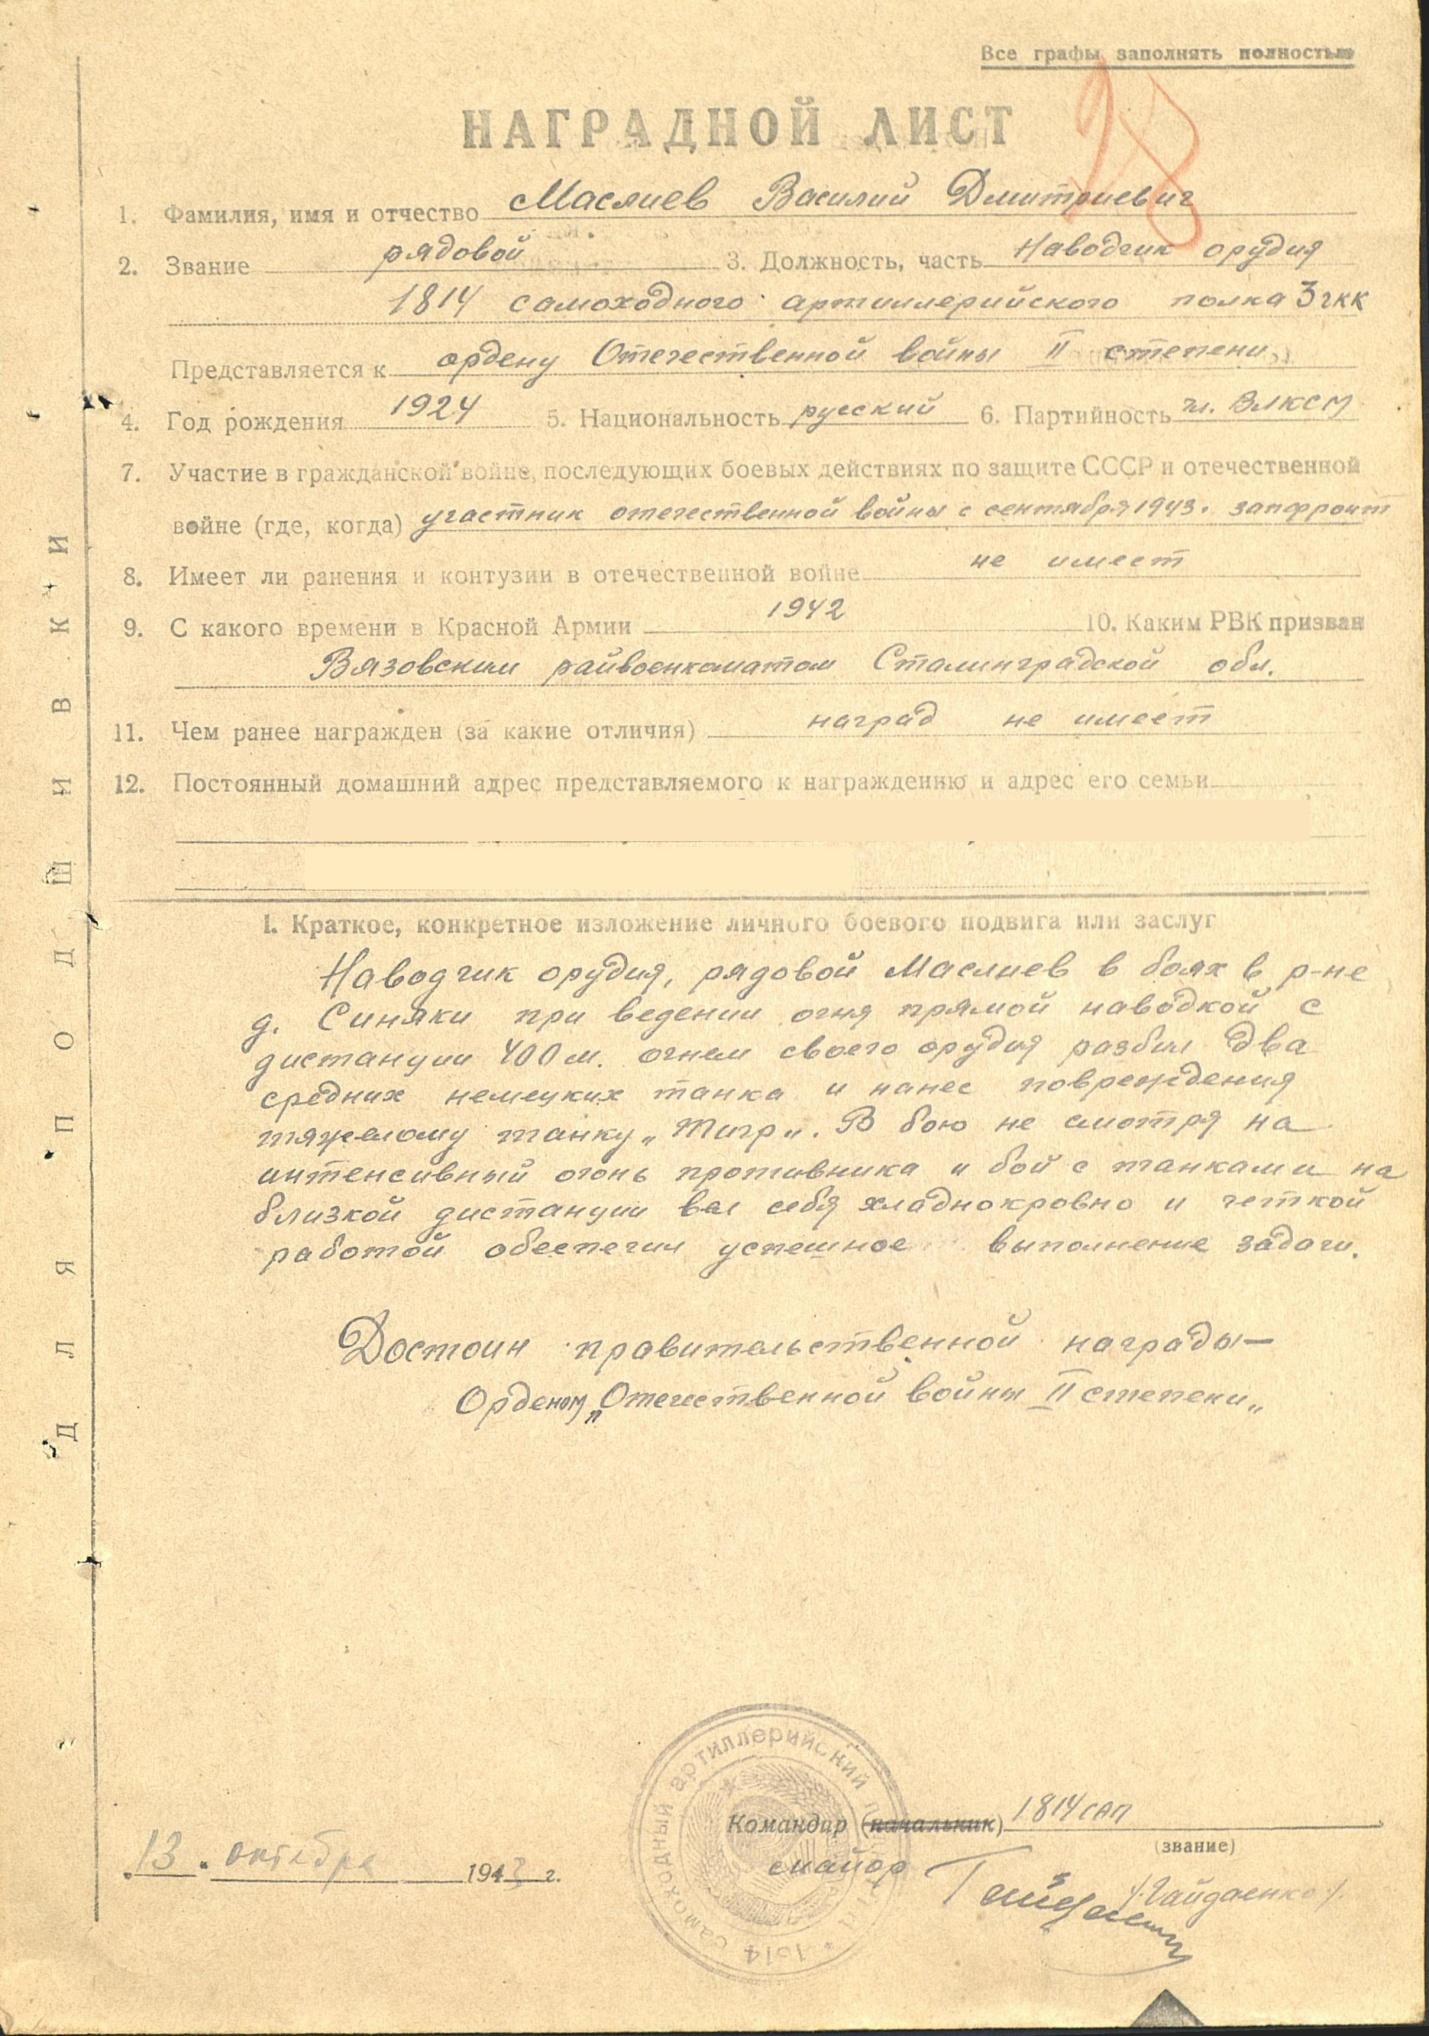 C:\Documents and Settings\Фёдор\Мои документы\История\Маслиев\3.jpg